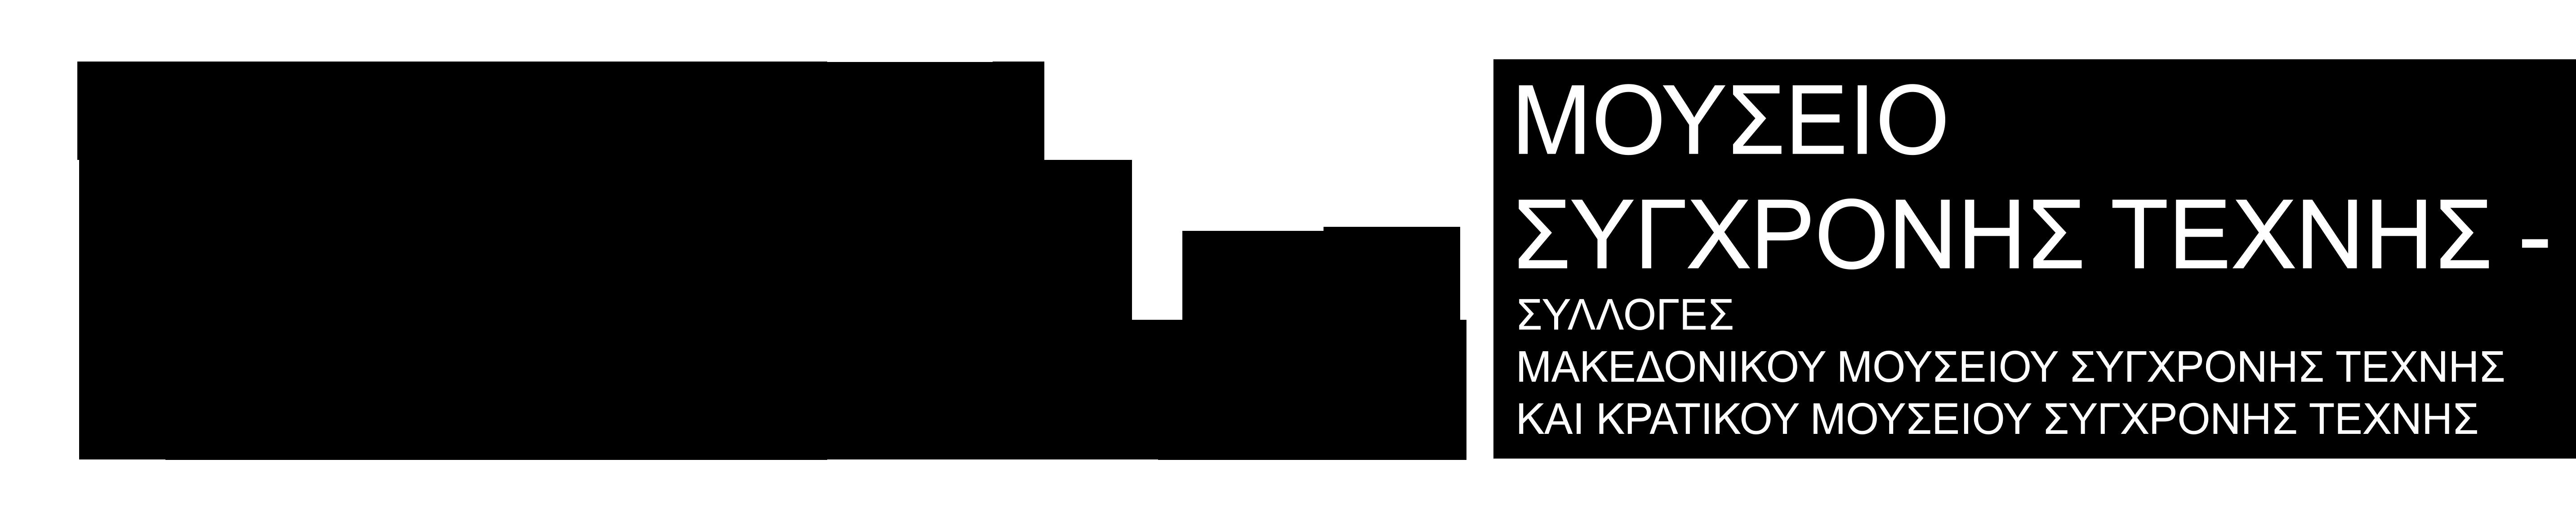 MOMus-Μουσείο Σύγχρονης Τέχνης-Συλλογές Μακεδονικού Μουσείου Σύγχρονης Τέχνης και Κρατικού Μουσείου Σύγχρονης Τέχνης